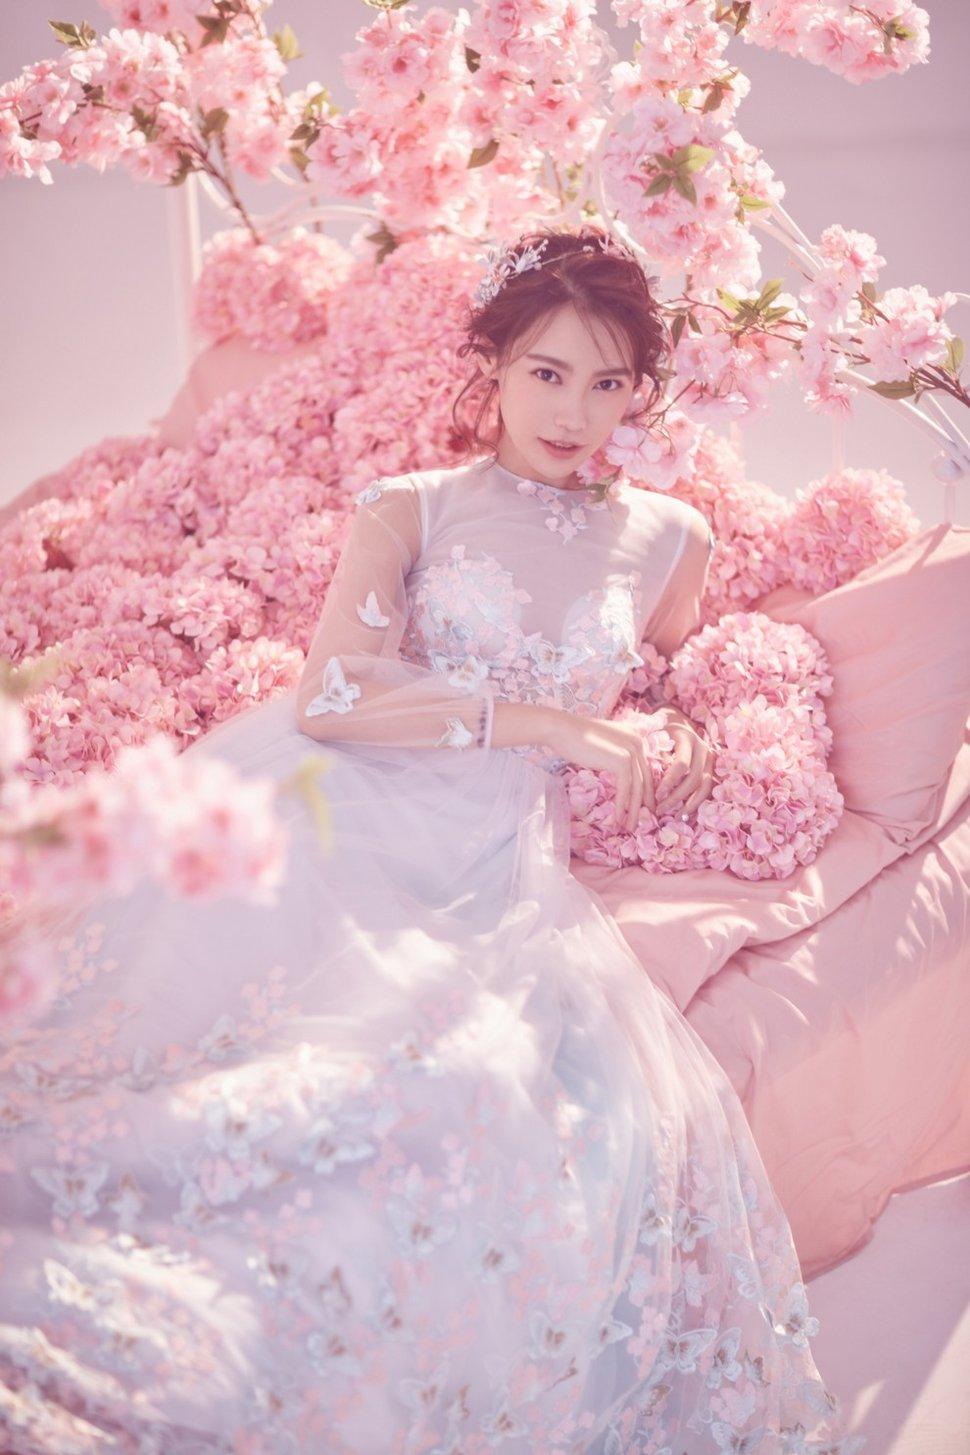 Prewedding-Photo-00004 - 車輪攝影 rolling《結婚吧》